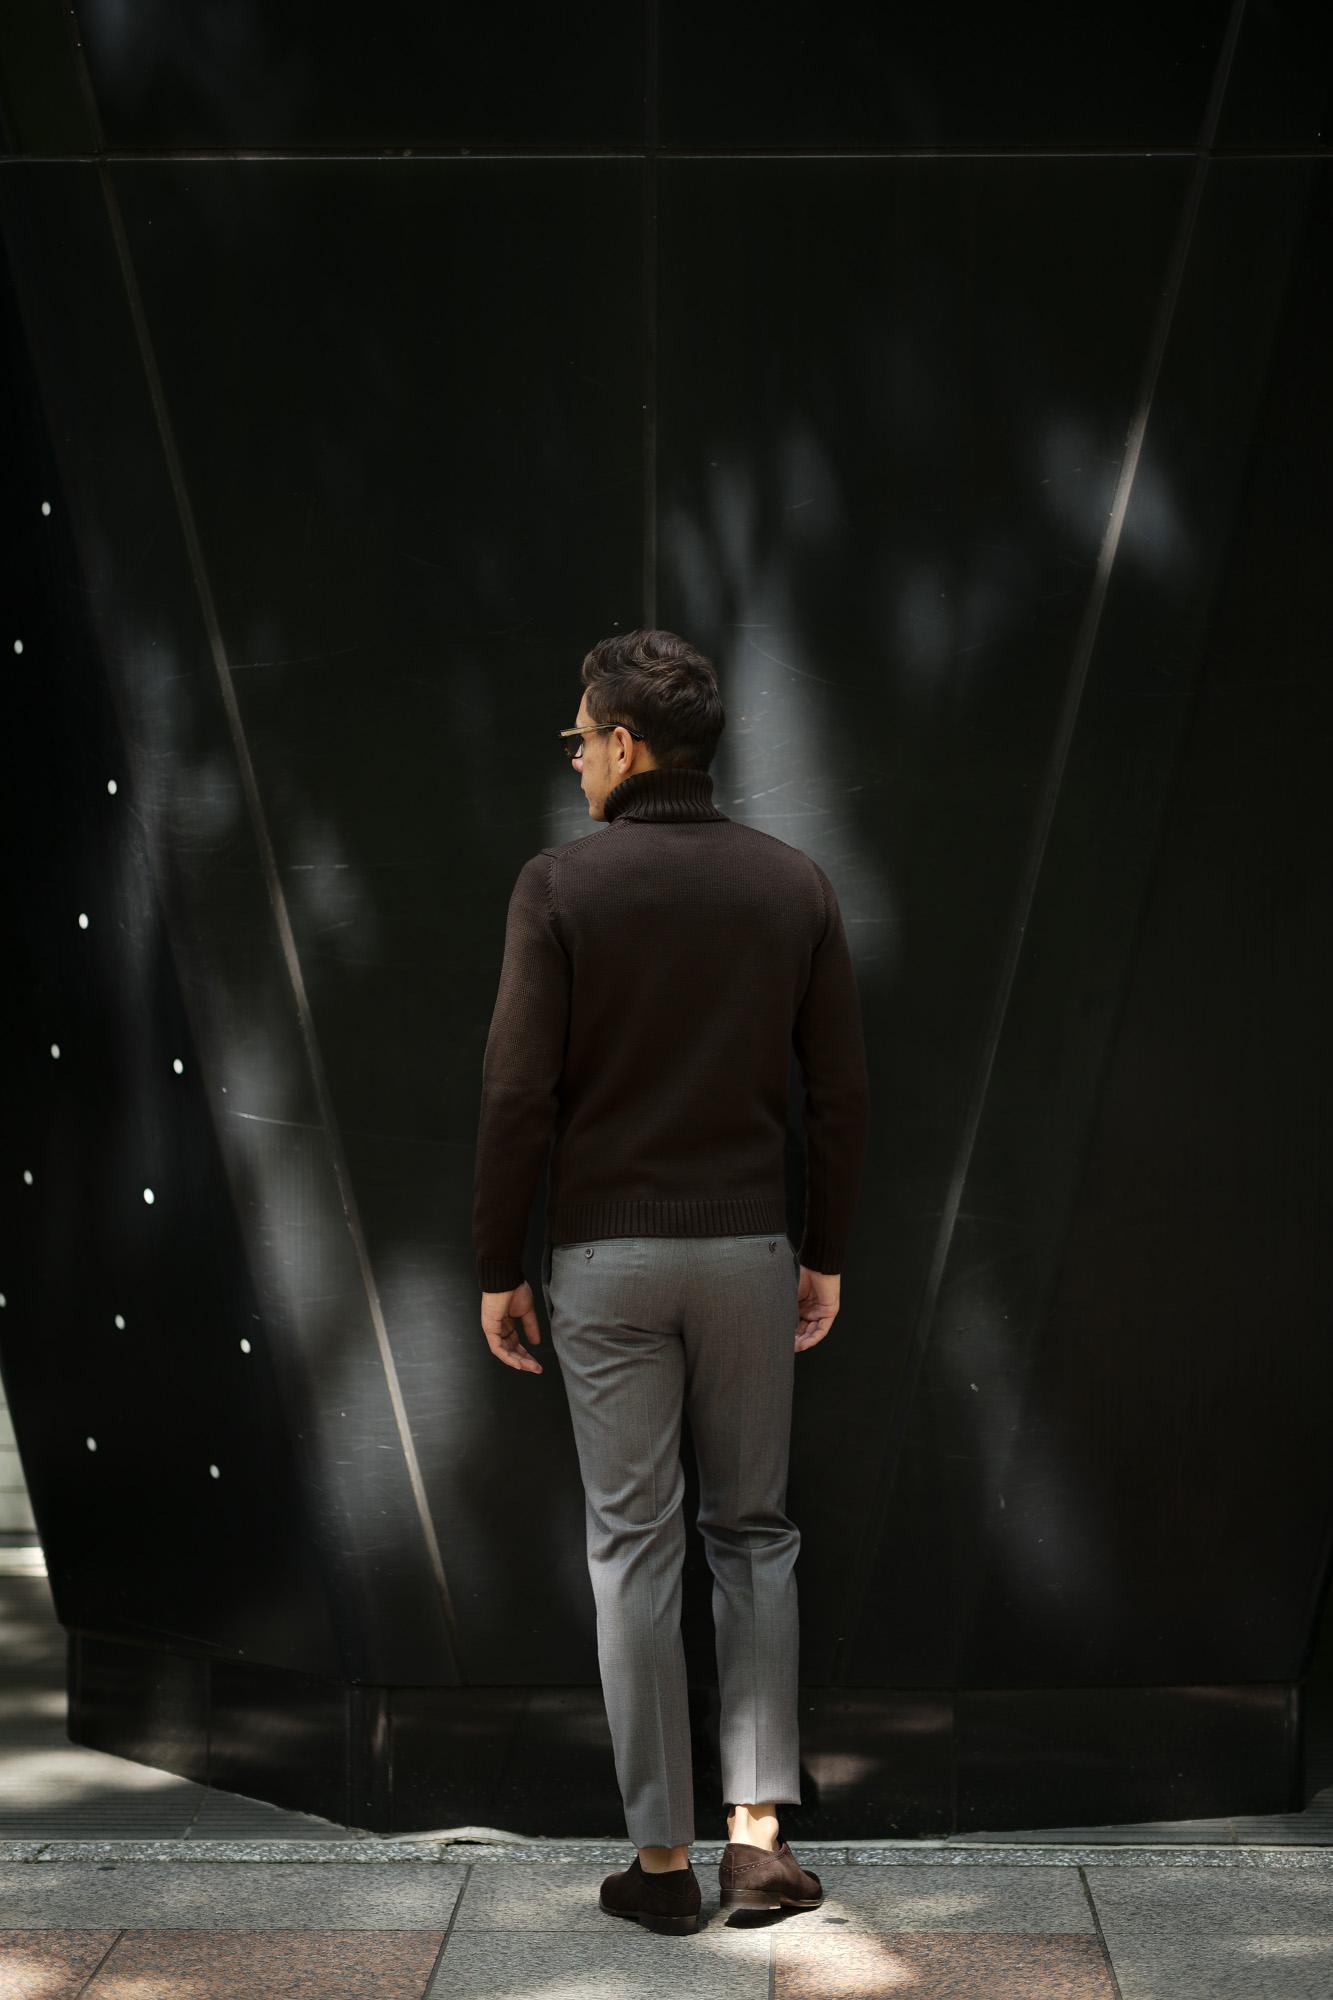 ZANONE (ザノーネ) Turtle Neck Sweater (タートルネックセーター) 810005 Z0229 VIRGIN WOOL 100% ミドルゲージ ウールニット セーター BROWN (ブラウン・Z5204) made in italy (イタリア製) 2019 秋冬 【ご予約受付中】zanone ニット クルーネック 愛知 名古屋 Alto e Diritto アルト エ デリット